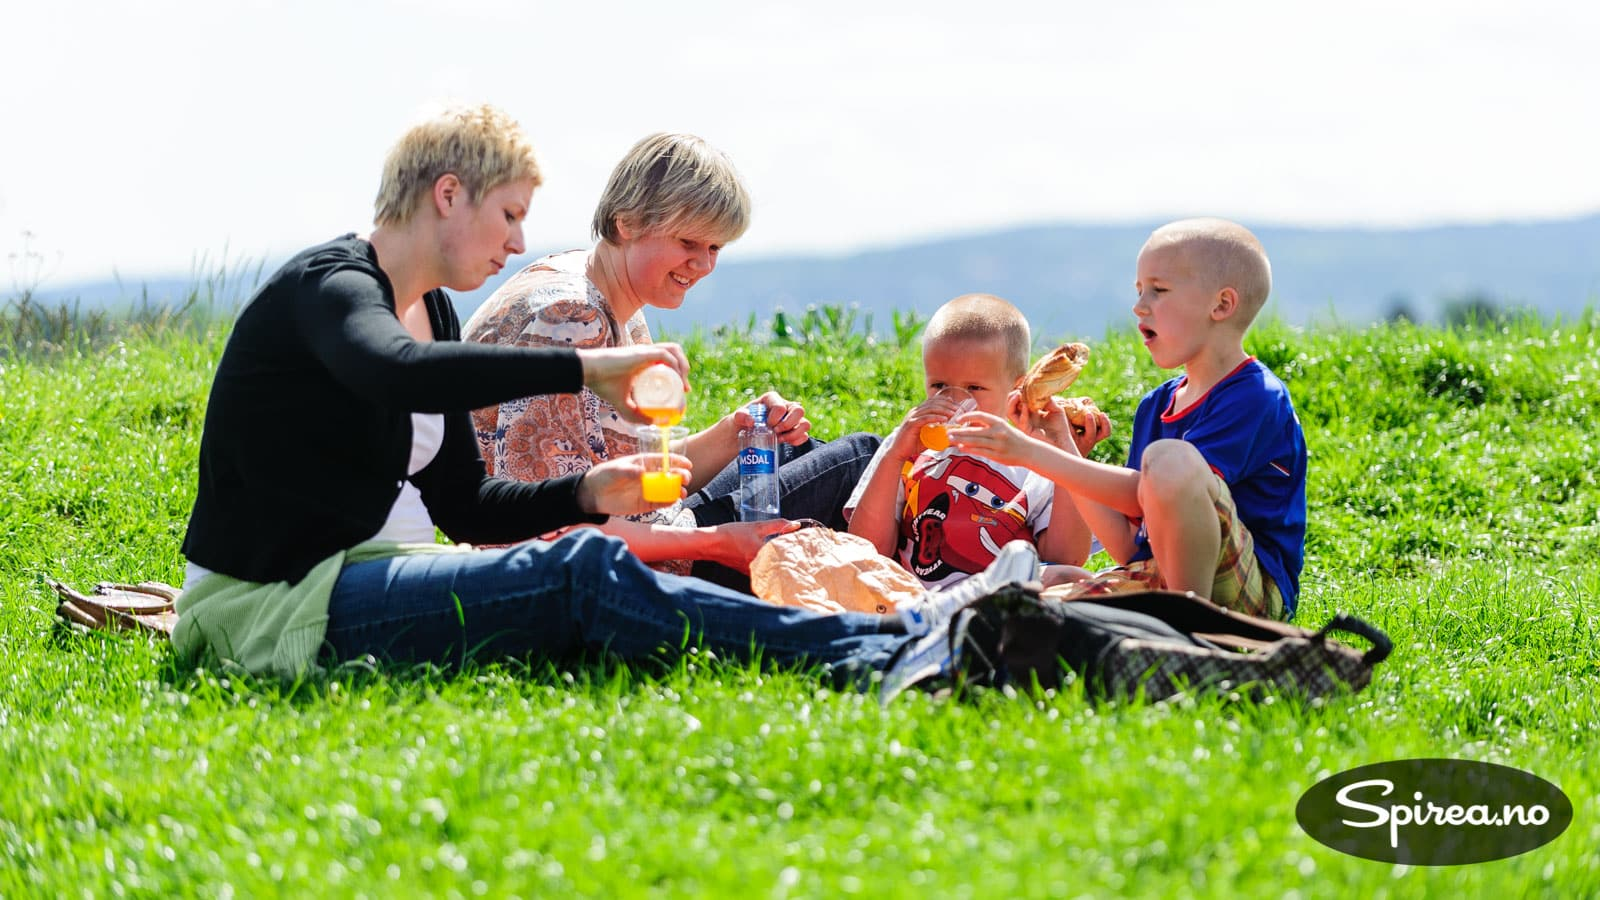 Kari Diesen Det Hender Så Mangt På Hovedøen - I Min Ungdoms Vår